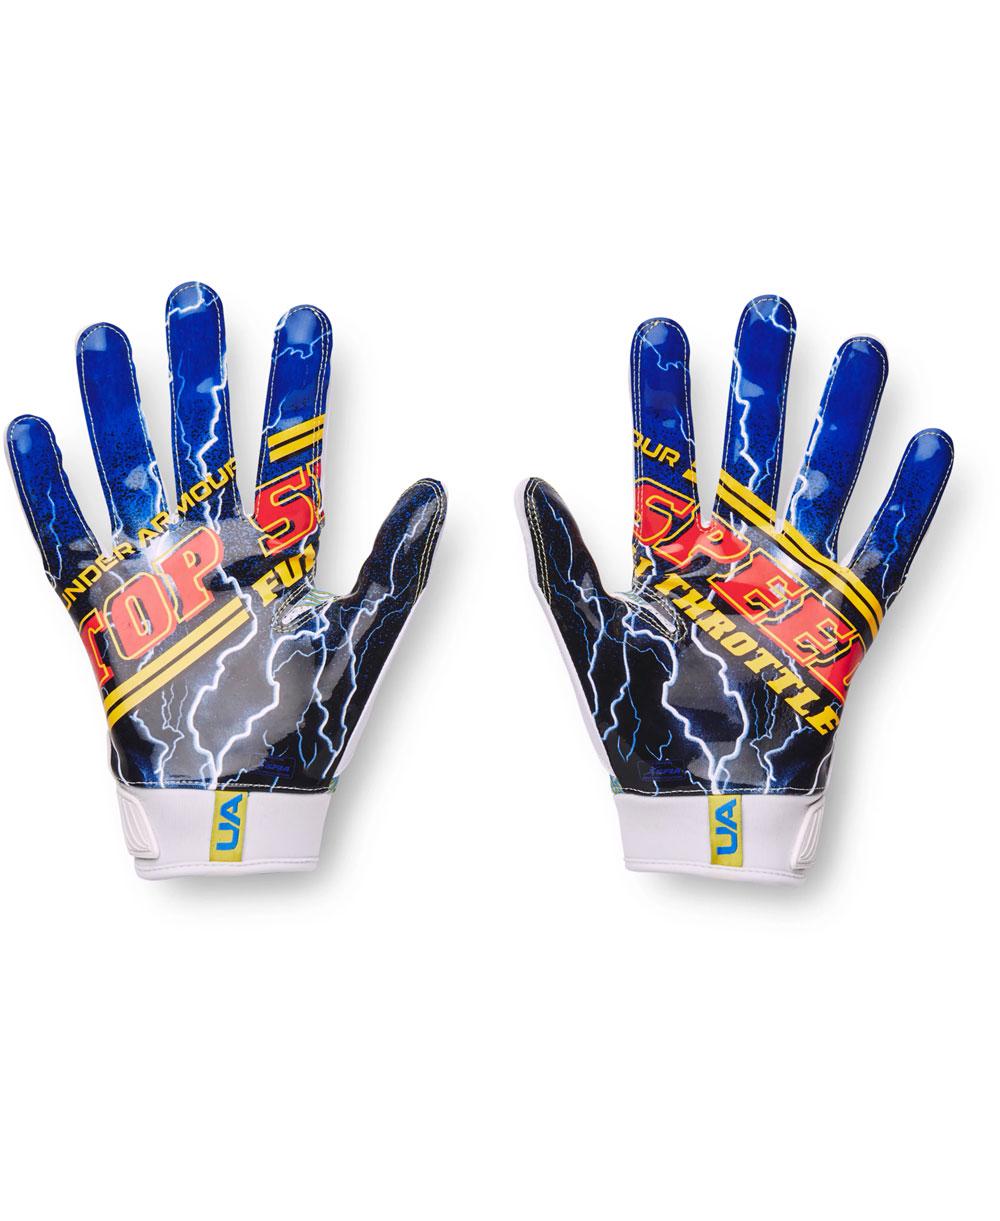 UA Blur LE Men's Football Gloves White/Blue Circuit